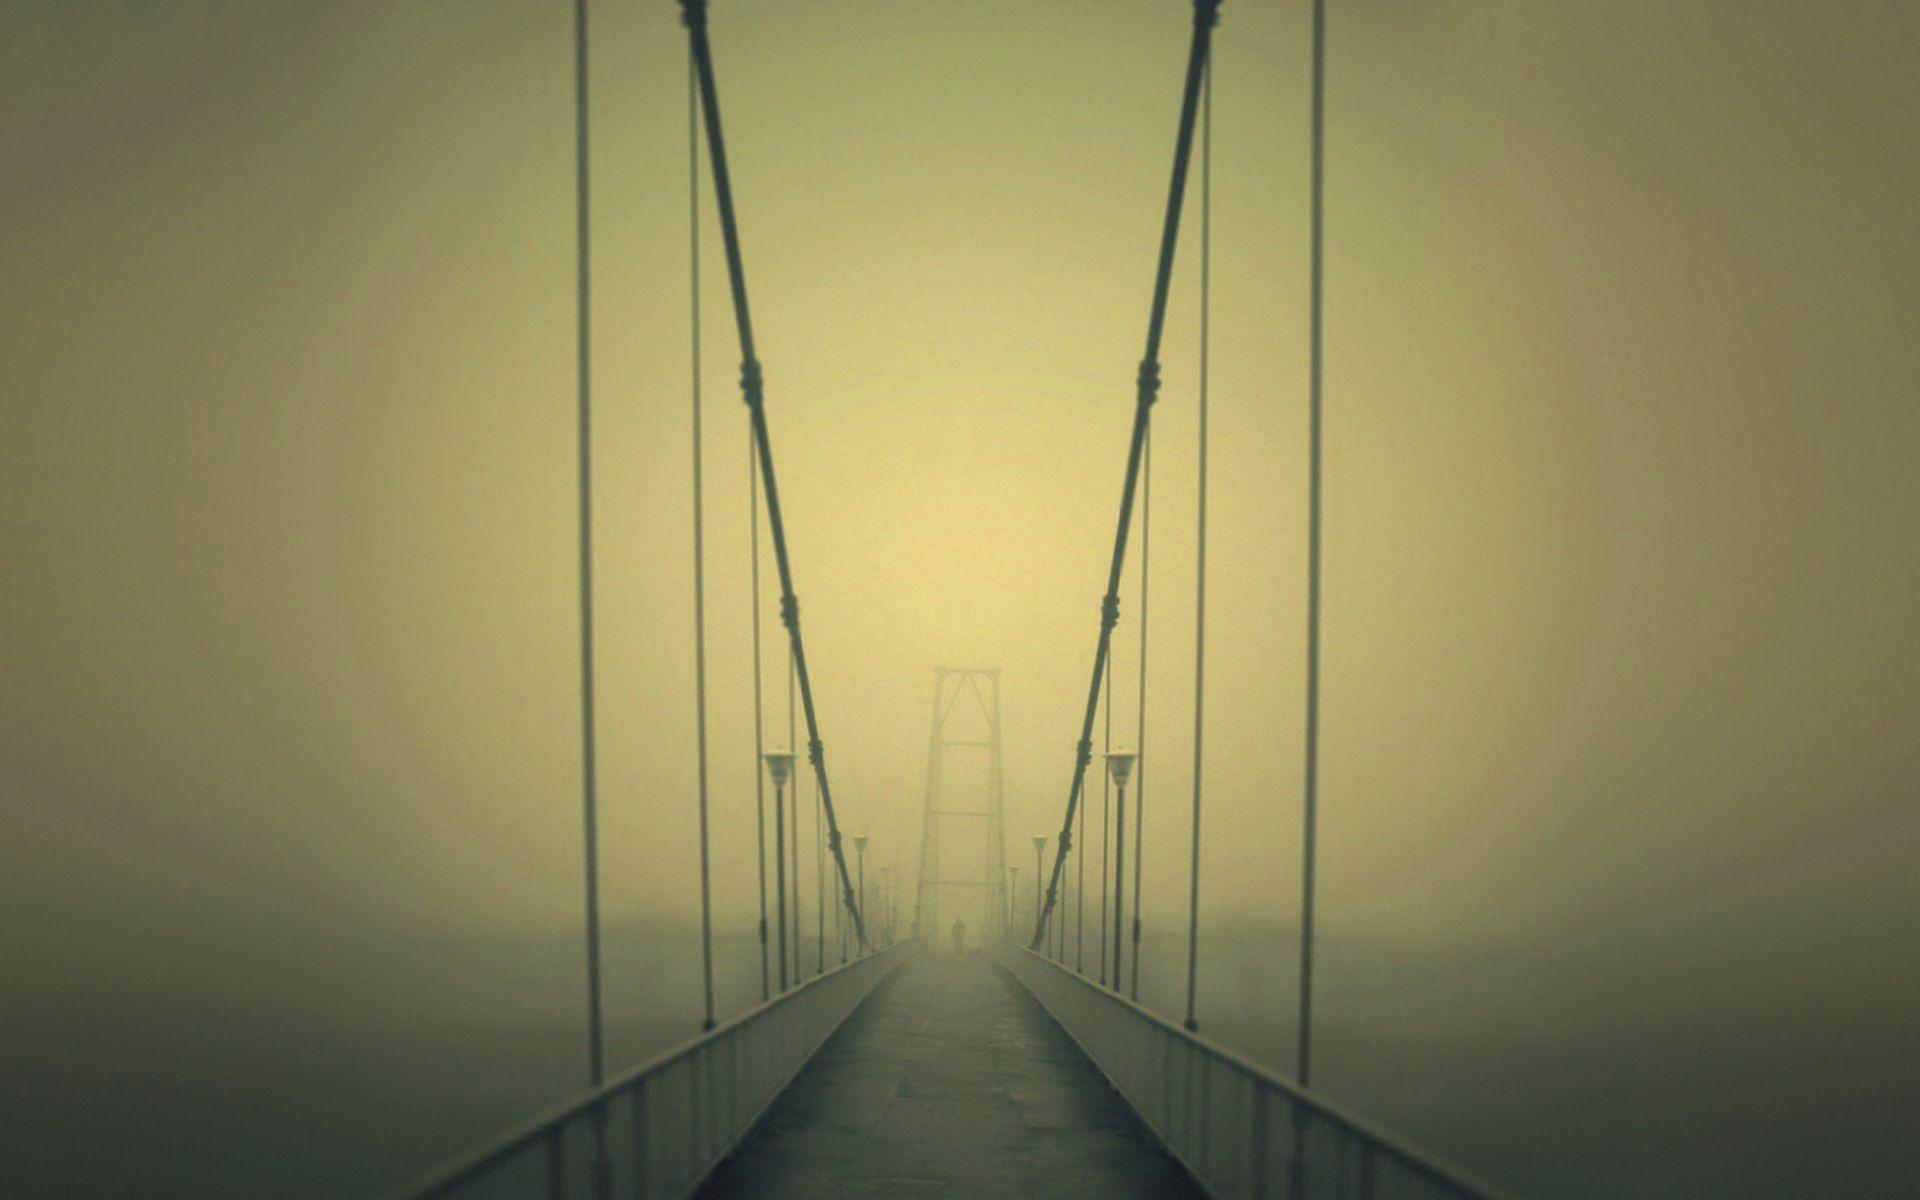 Slender Man Wallpaper Bridge Wallpaper Creepy Wallpapers Scary Bridges